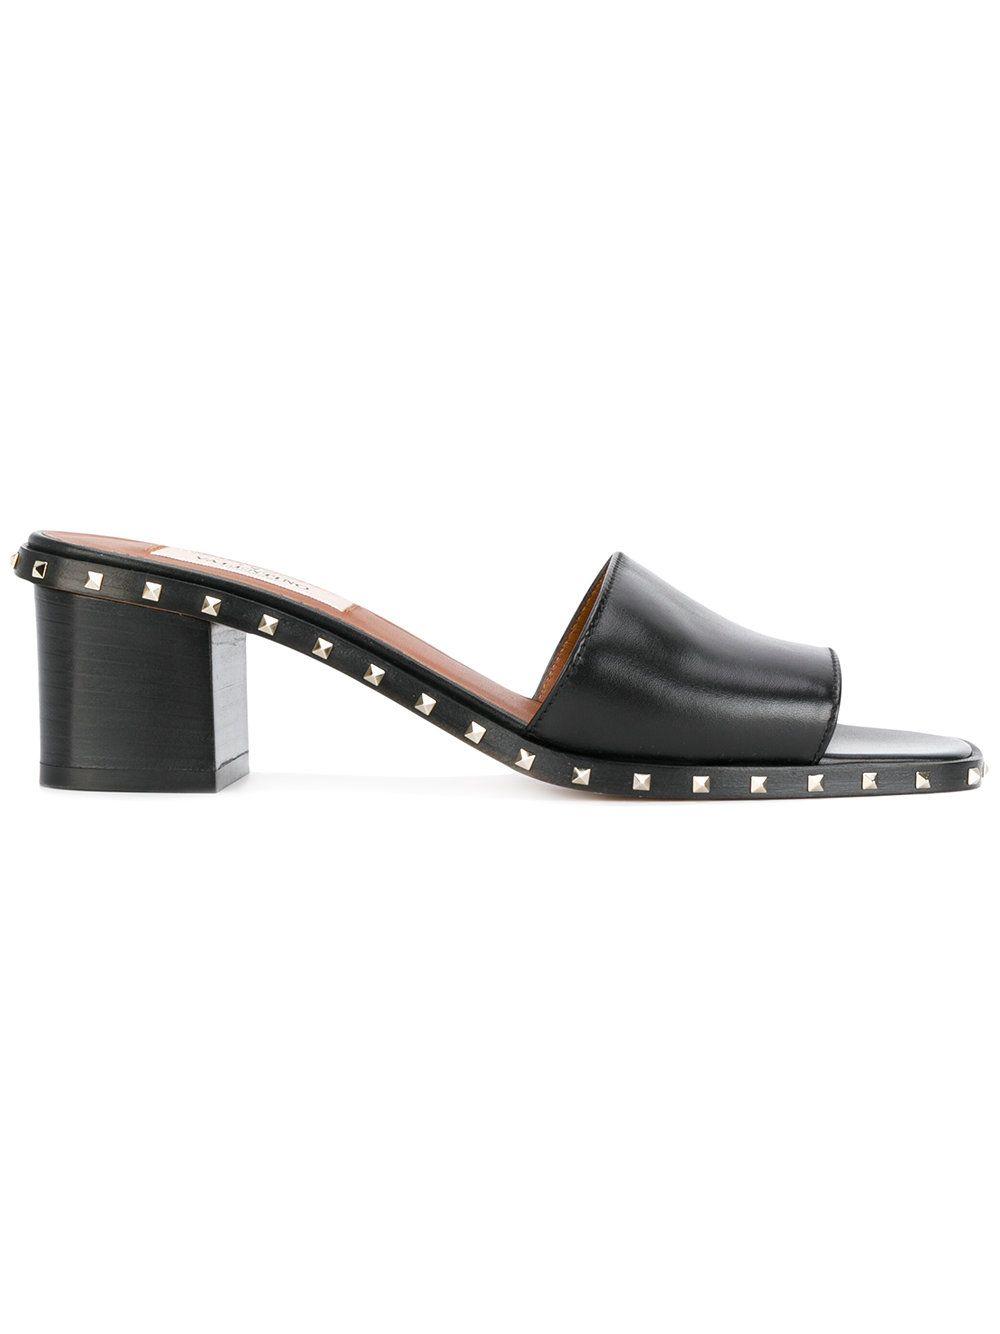 f28a7ebb0 VALENTINO   Valentino Garavani Soul Rockstud slide mules #Shoes #VALENTINO